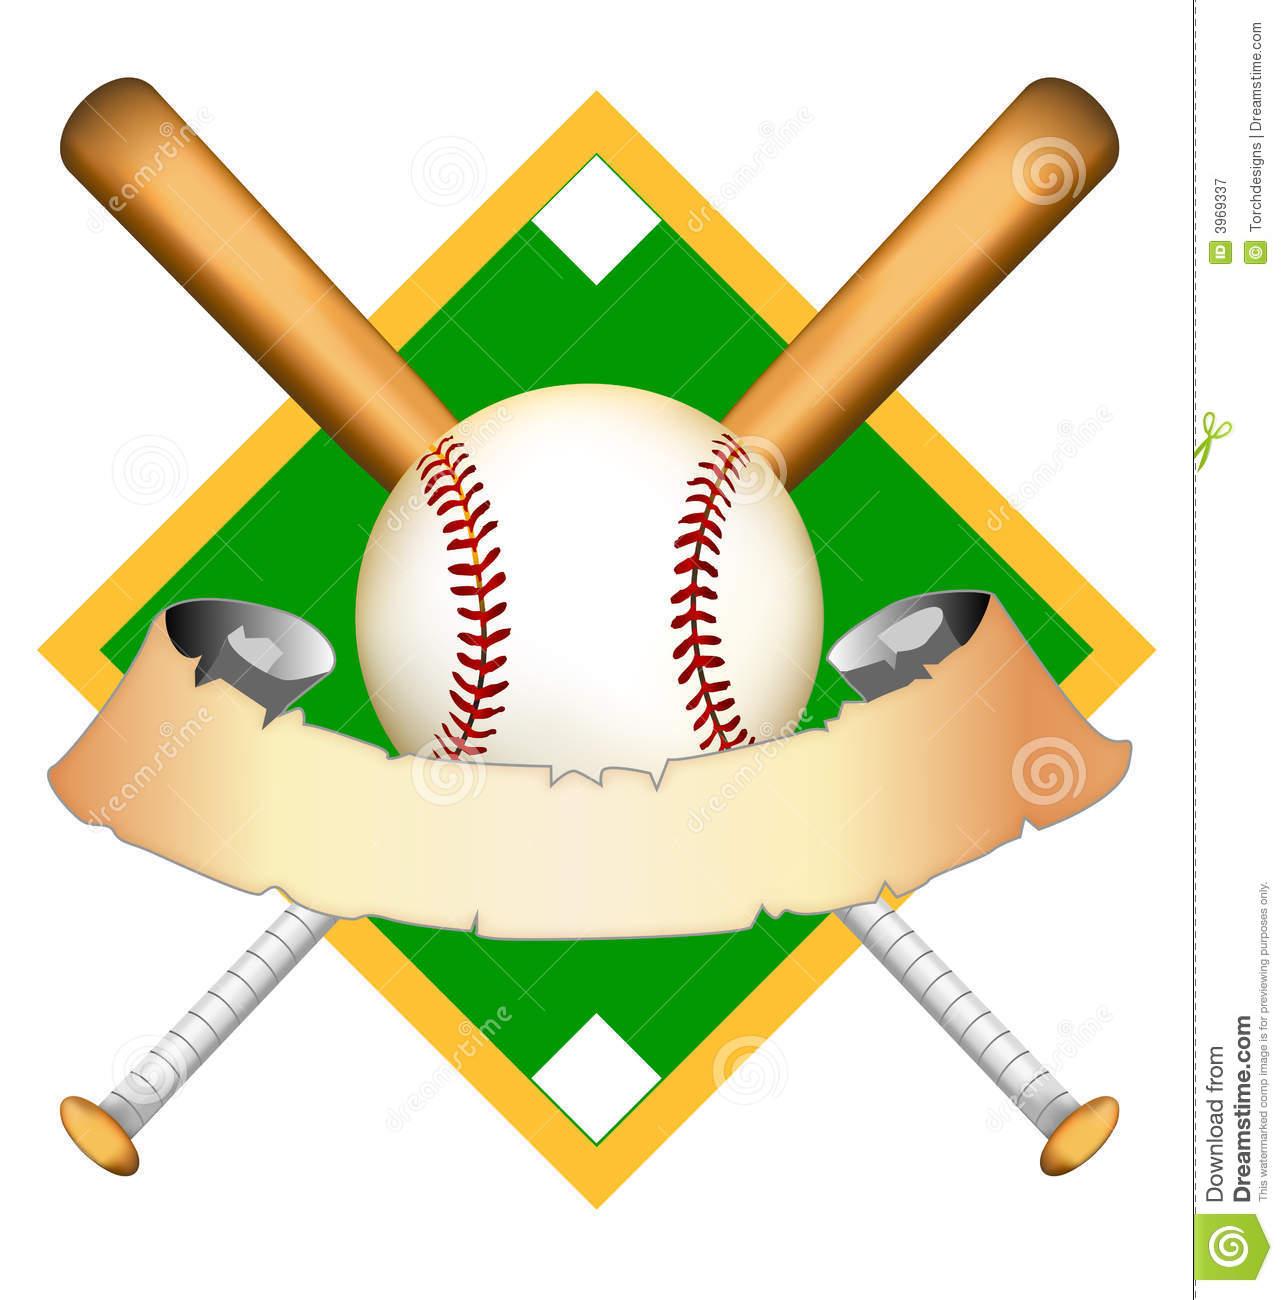 Diamond clipart softball diamond And Clipart baseball%20diamond%20clipart%20black%20and%20white Diamond Clipart